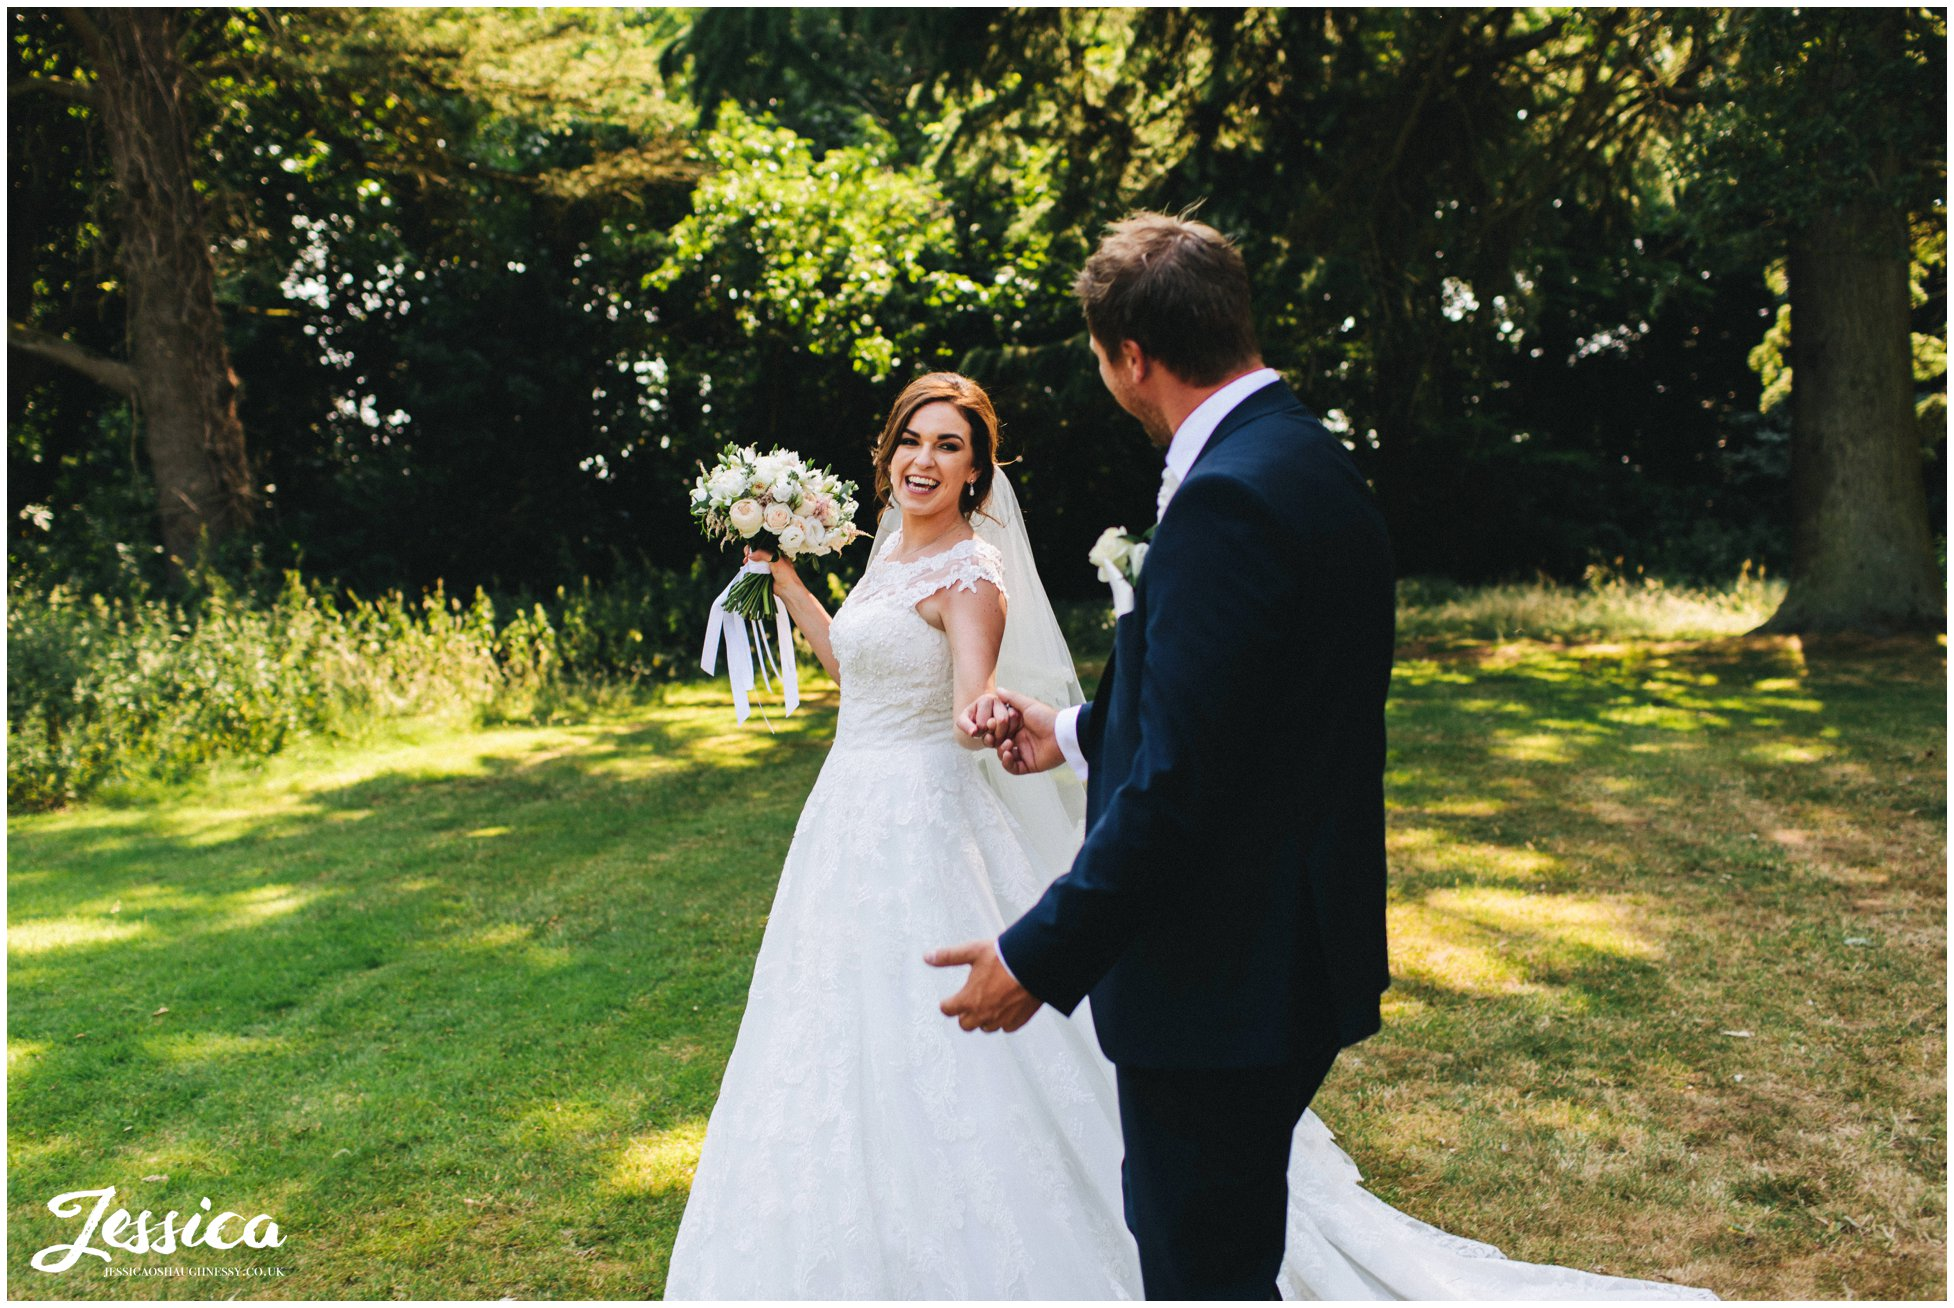 Bartle Hall wedding photographer in lancashire